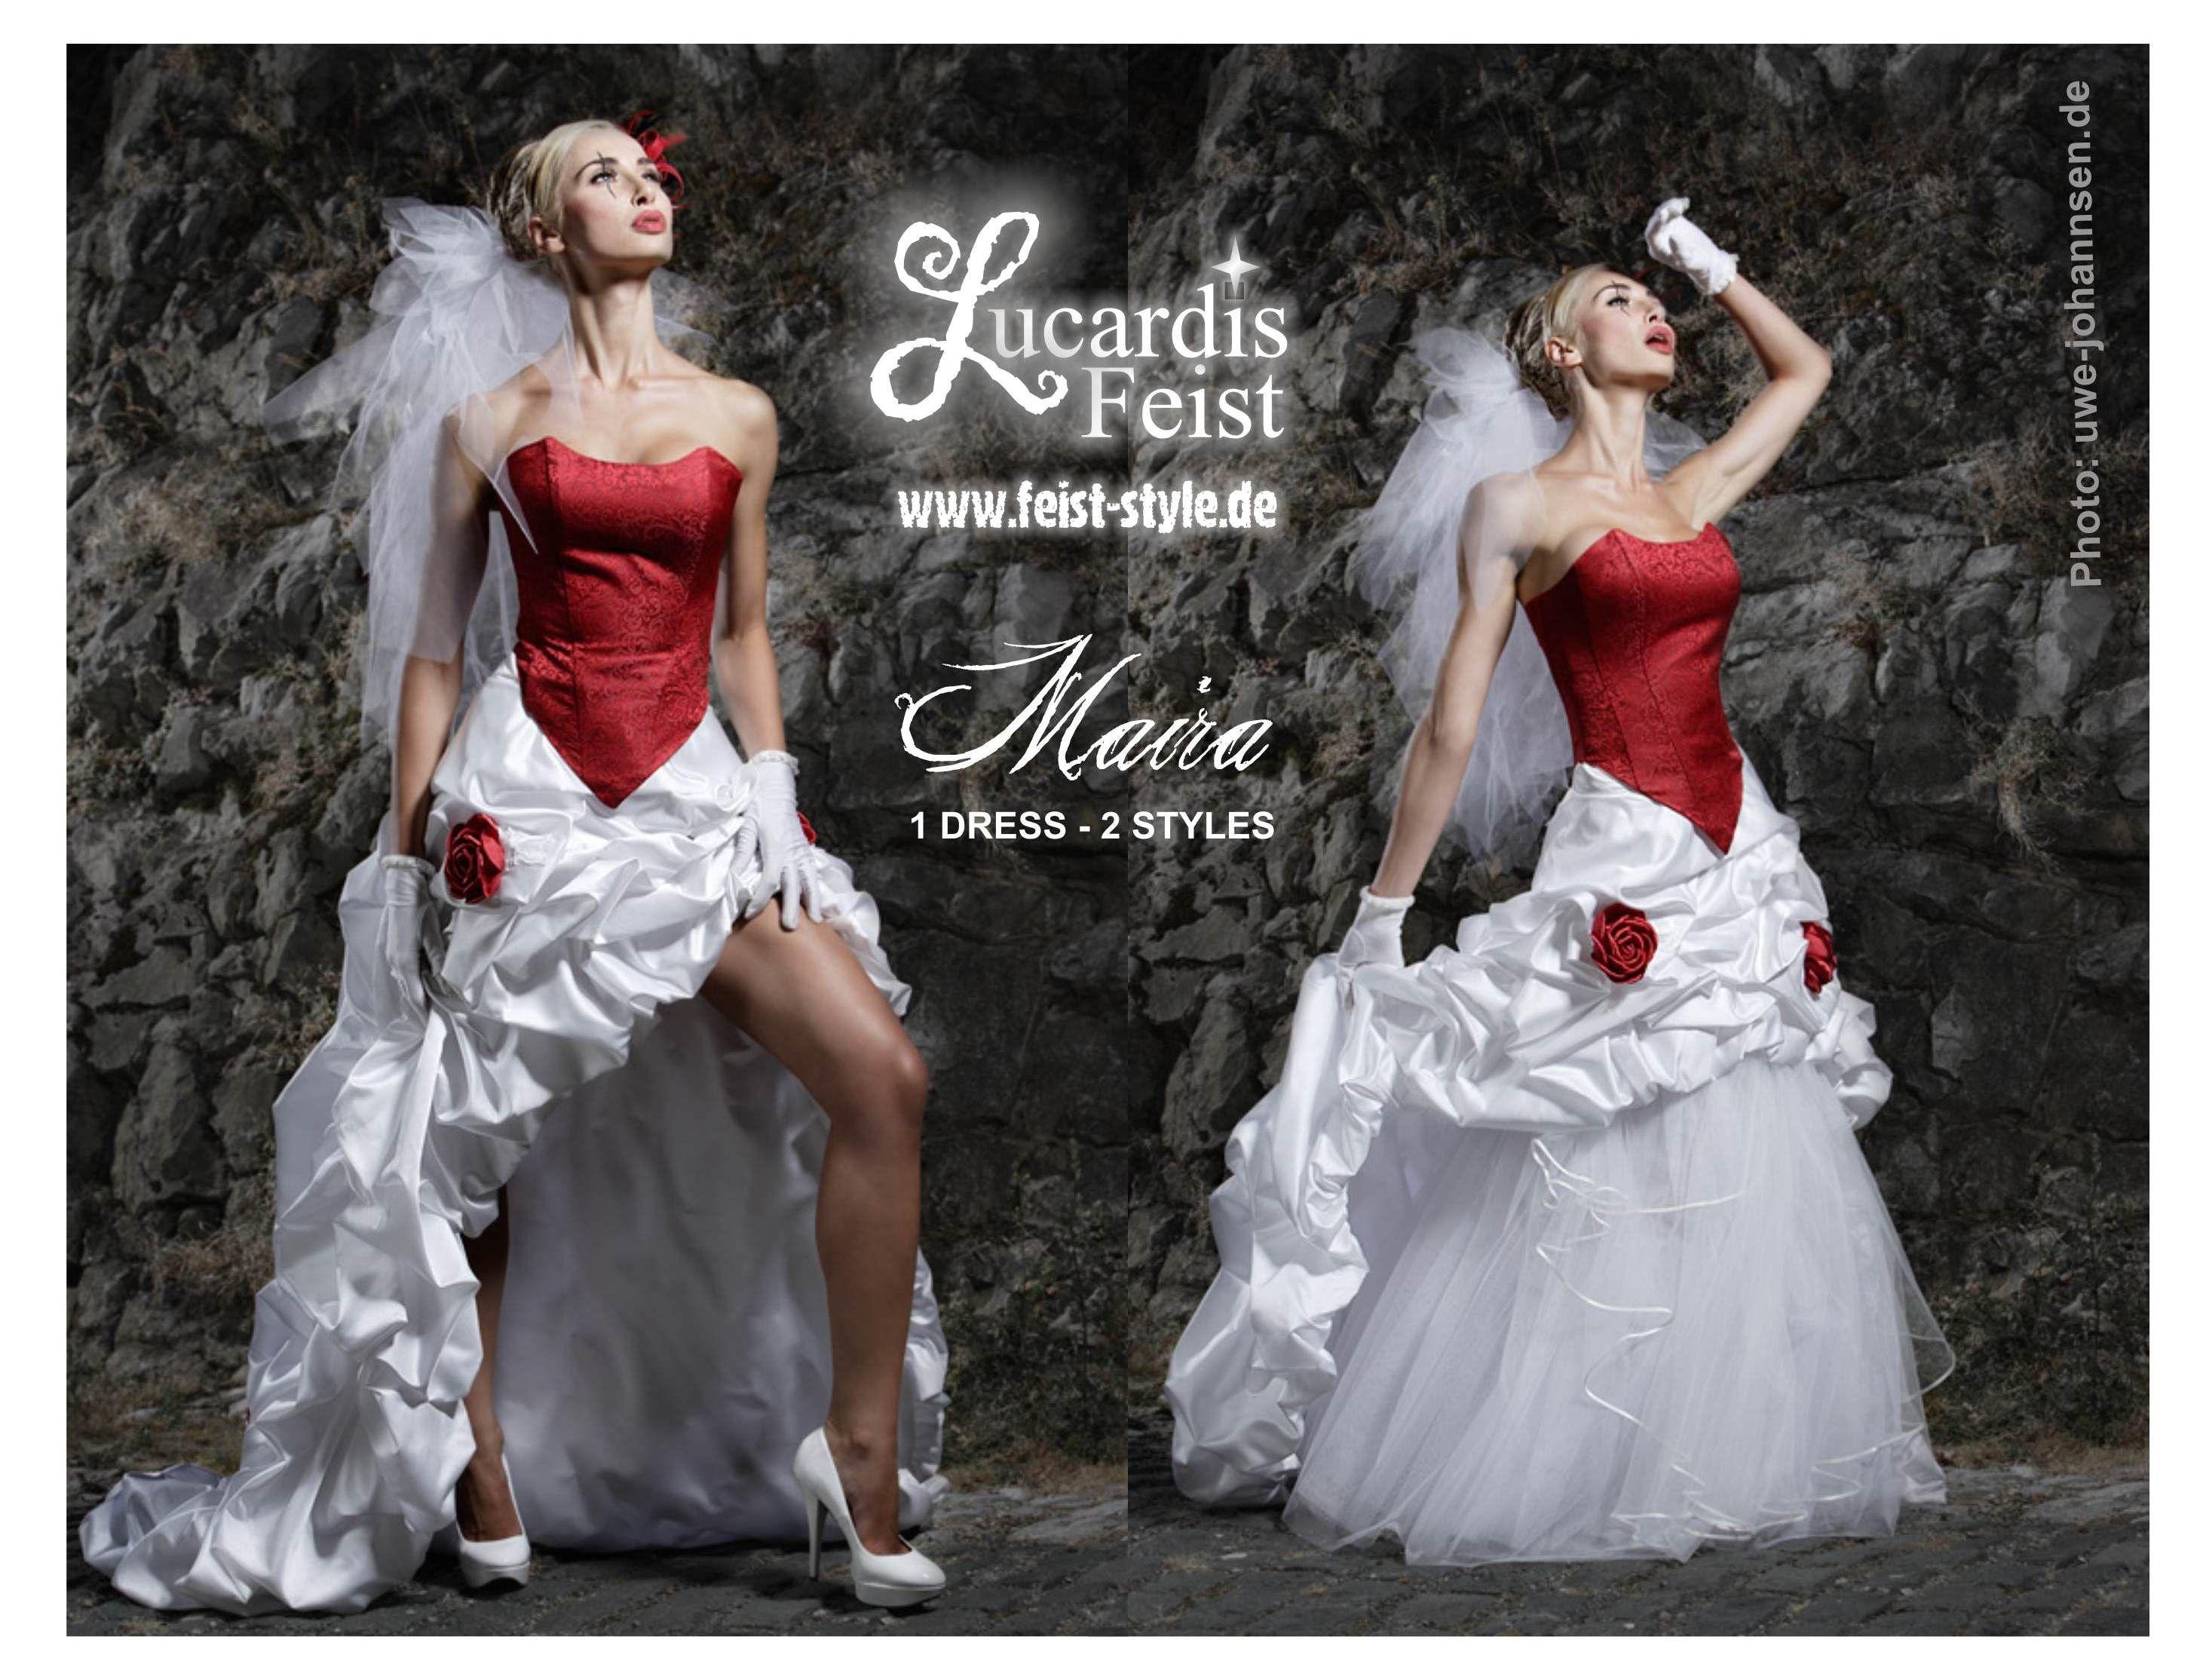 Lucardis Feist - Besondere Brautmode. Extravagantes Brautkleid in ...